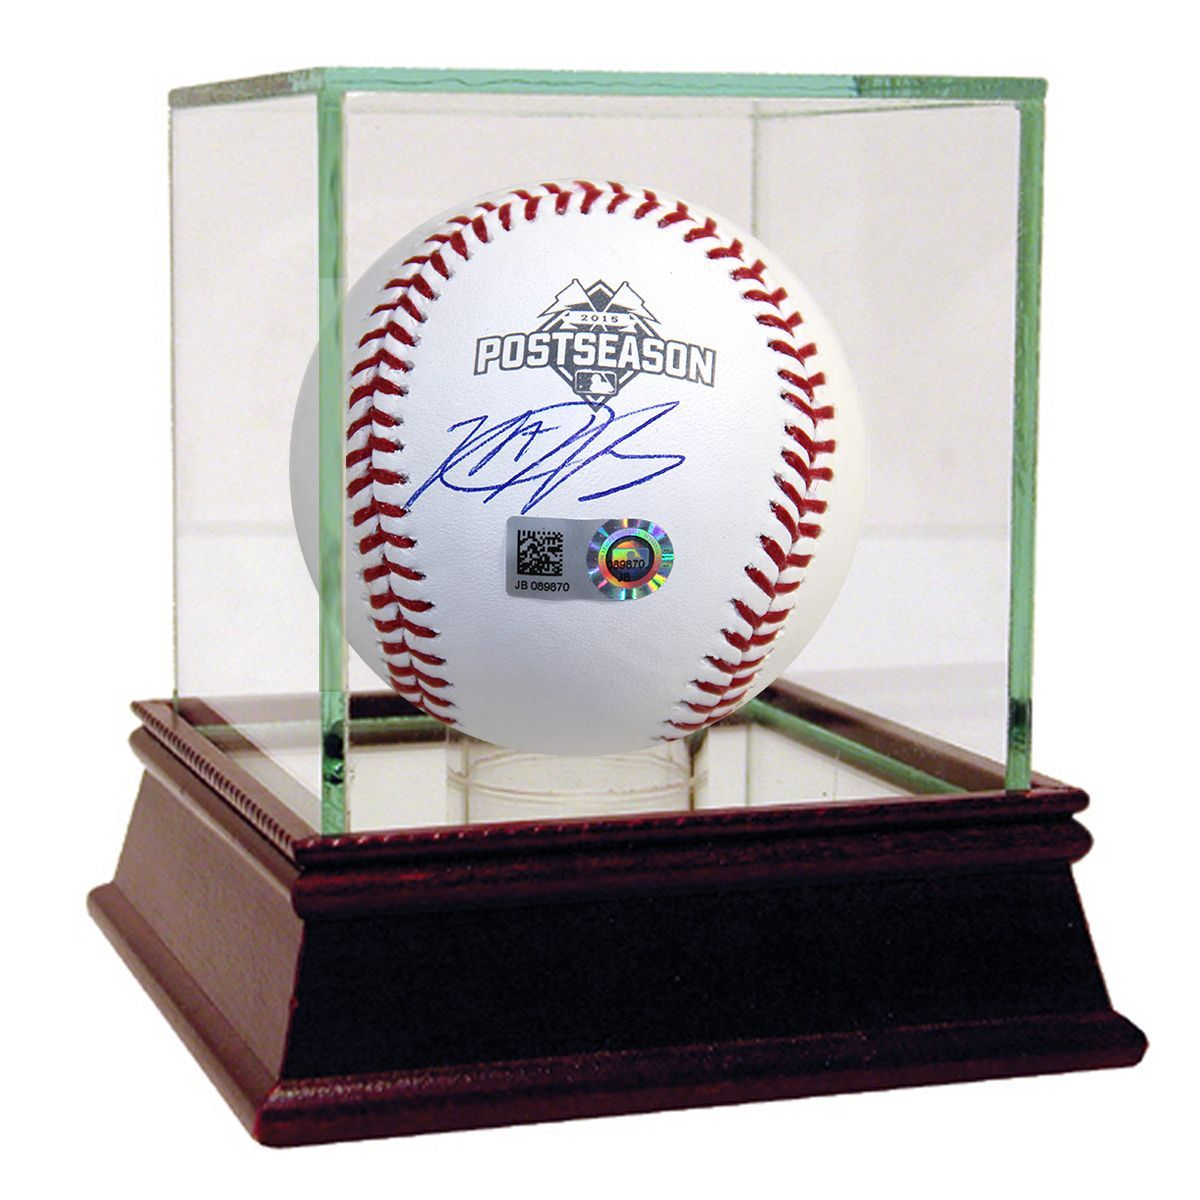 Steiner Matt Harvey Signed 2015 Postseason Logo MLB Baseball